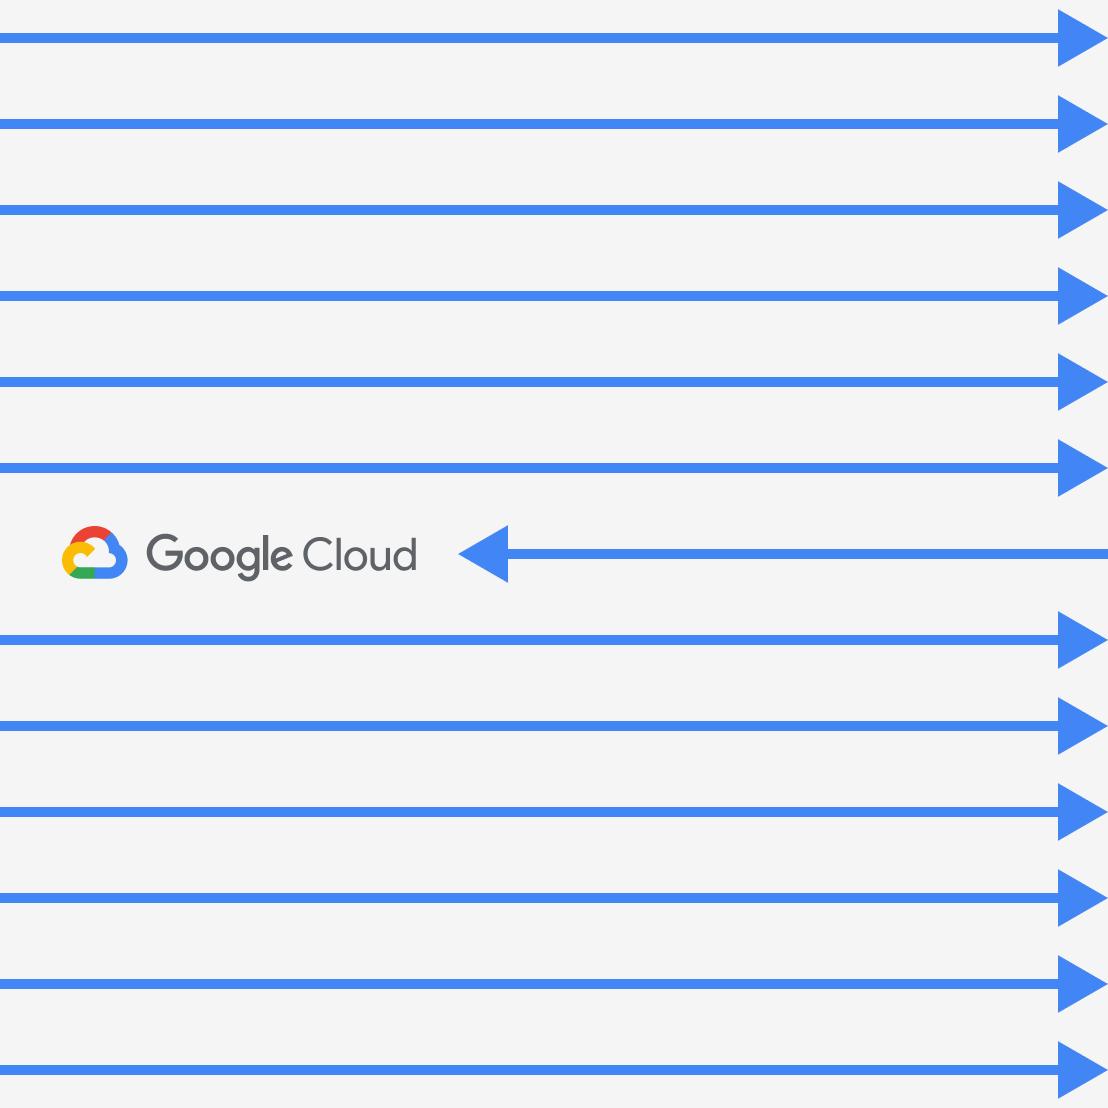 google cloud diagram software